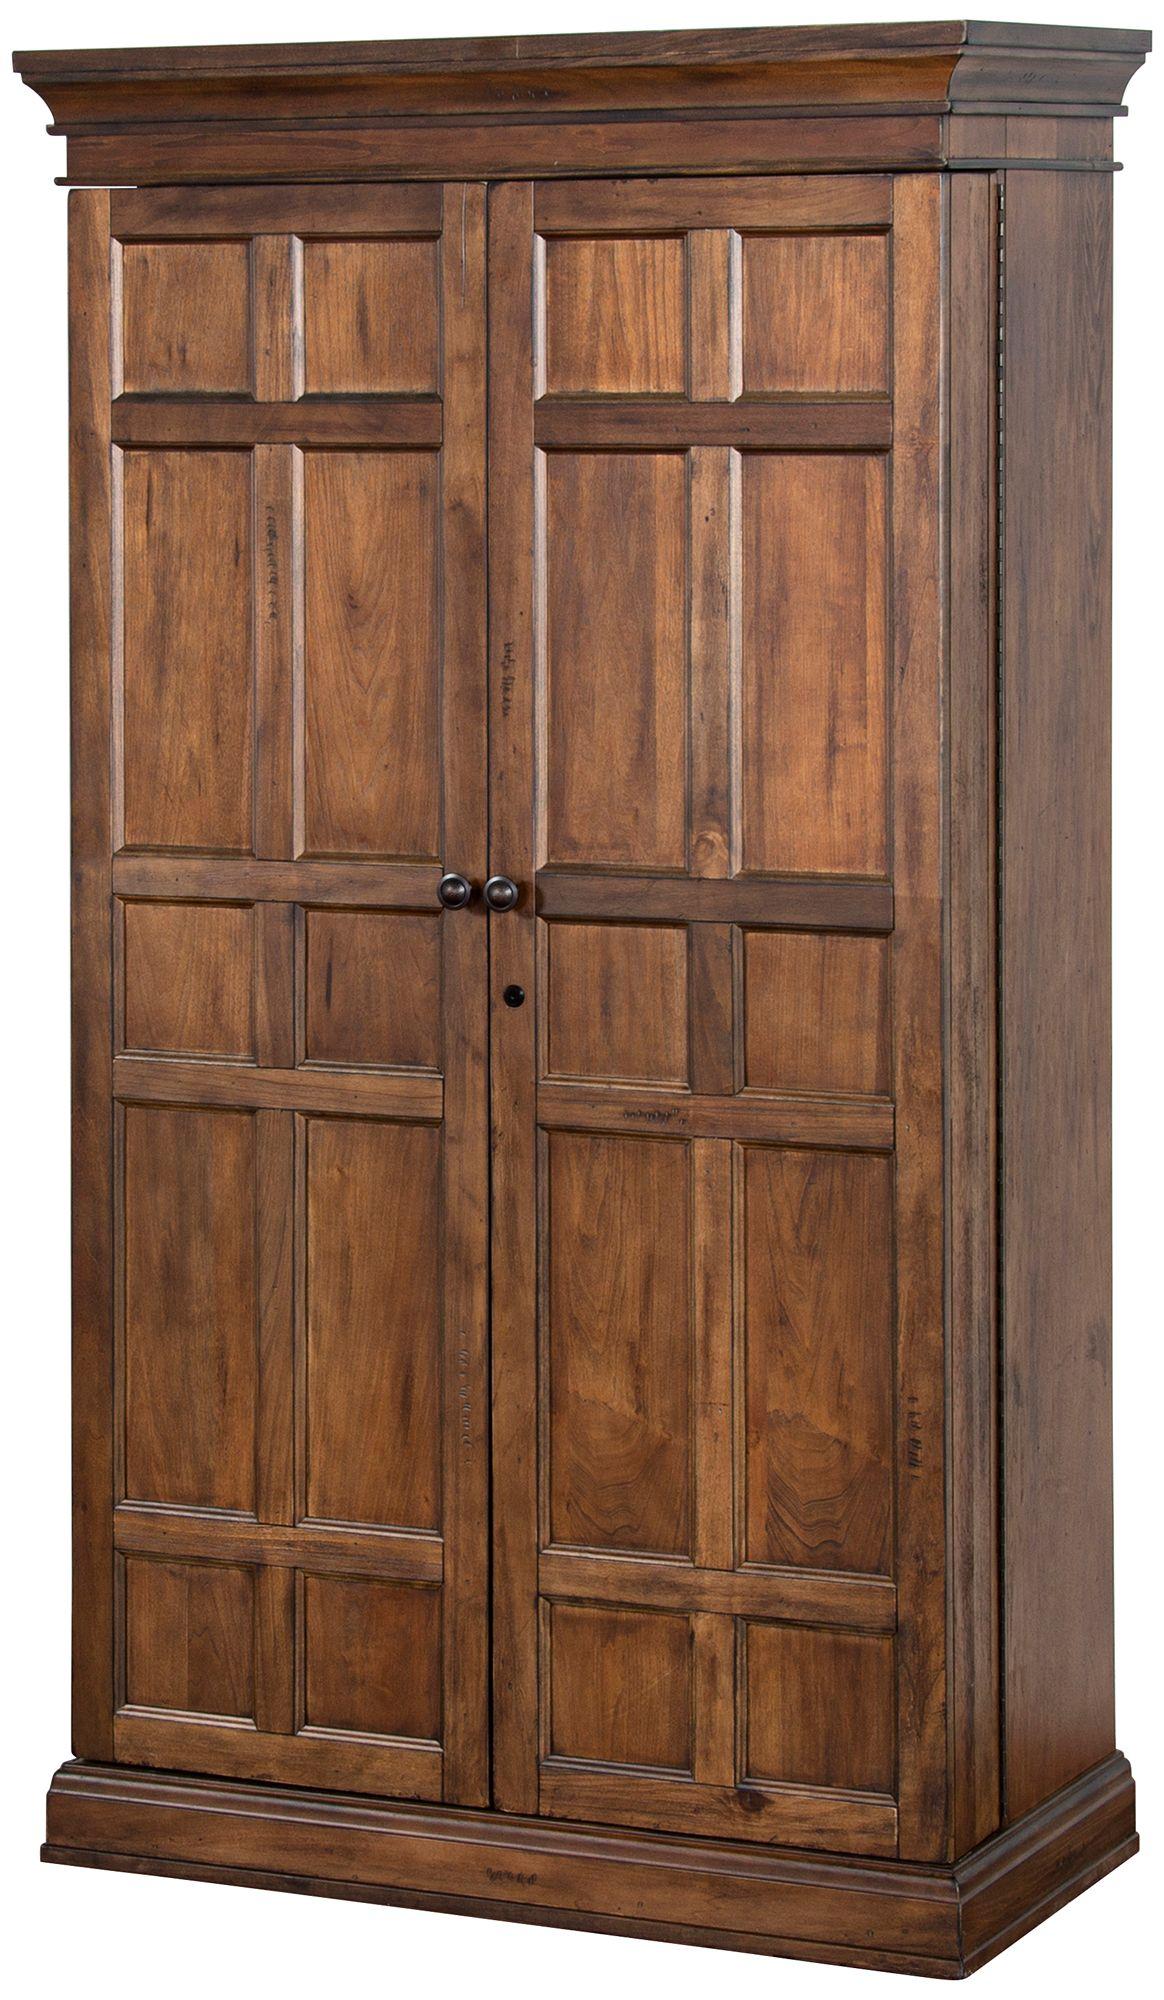 Savannah Antique Charcoal Wood 2 Door Bar Armoire